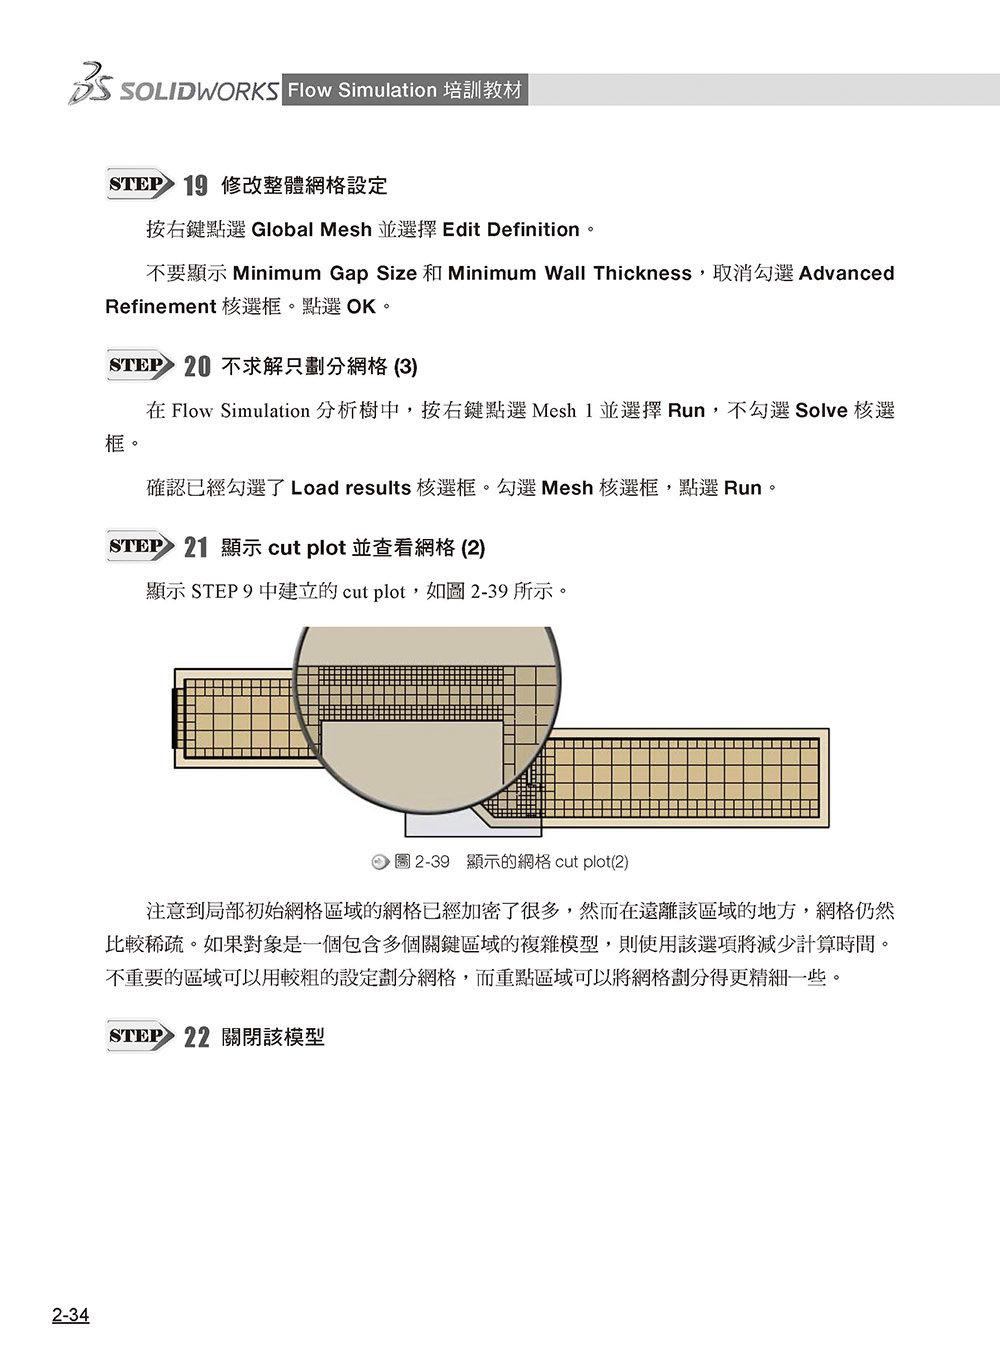 SOLIDWORKS Flow Simulation 培訓教材<繁體中文版>-preview-16